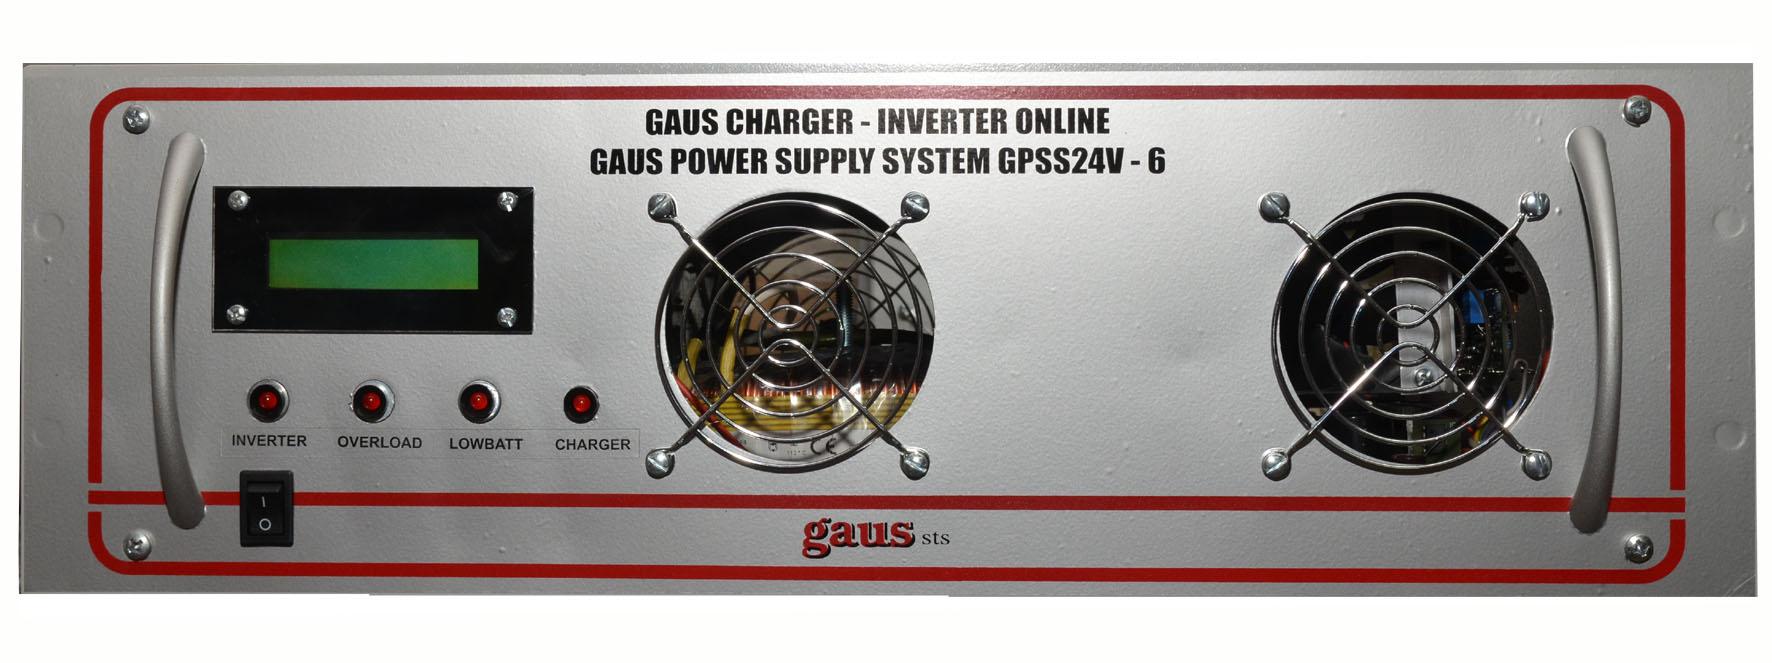 GPSS24V-6_3F650WCH